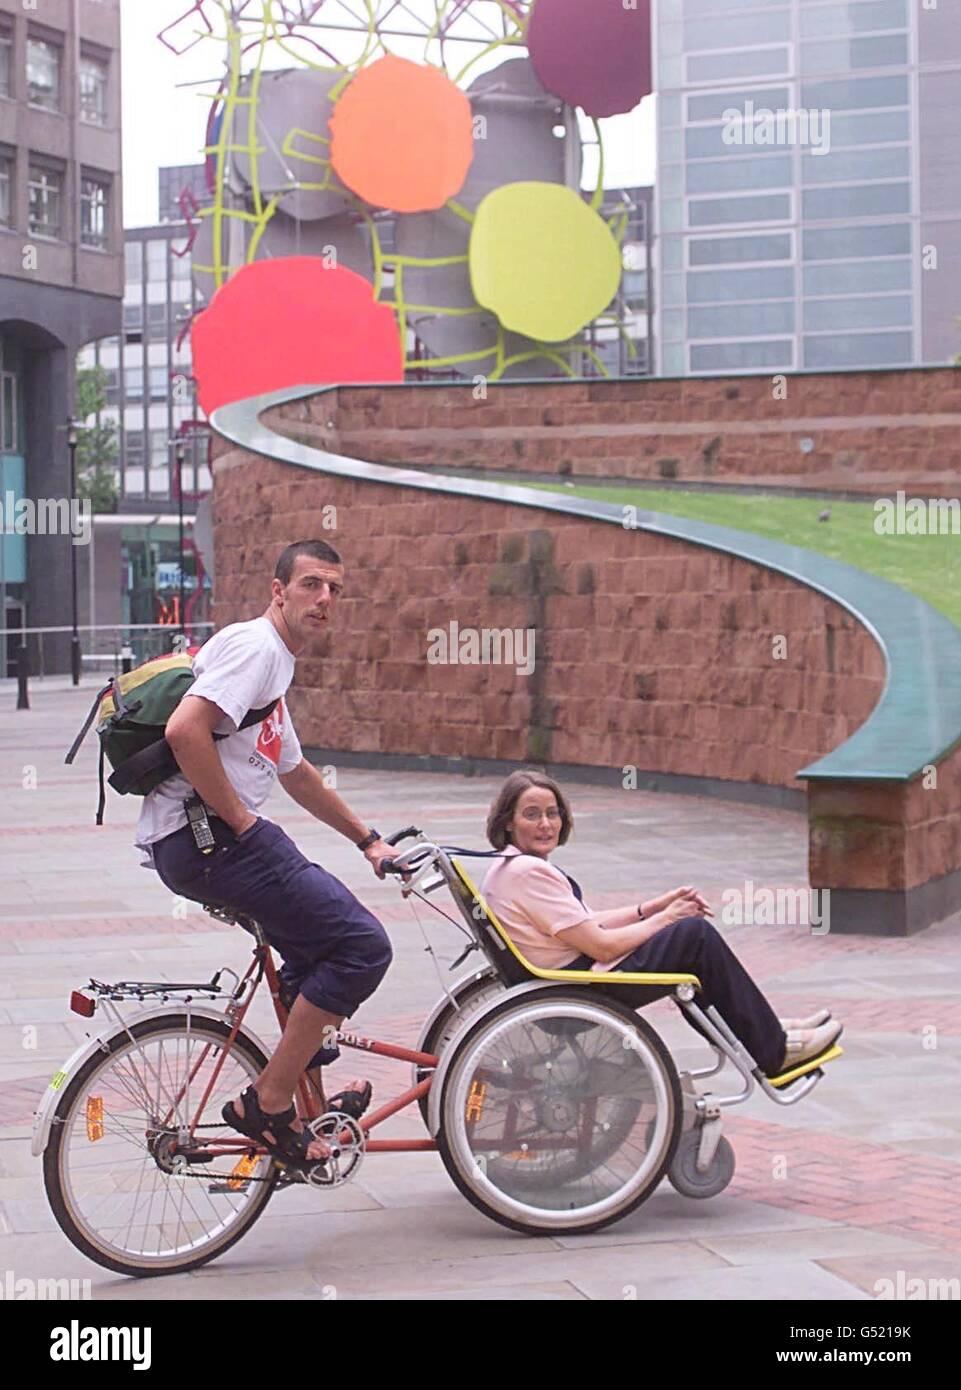 Bike to Work Day - Stock Image